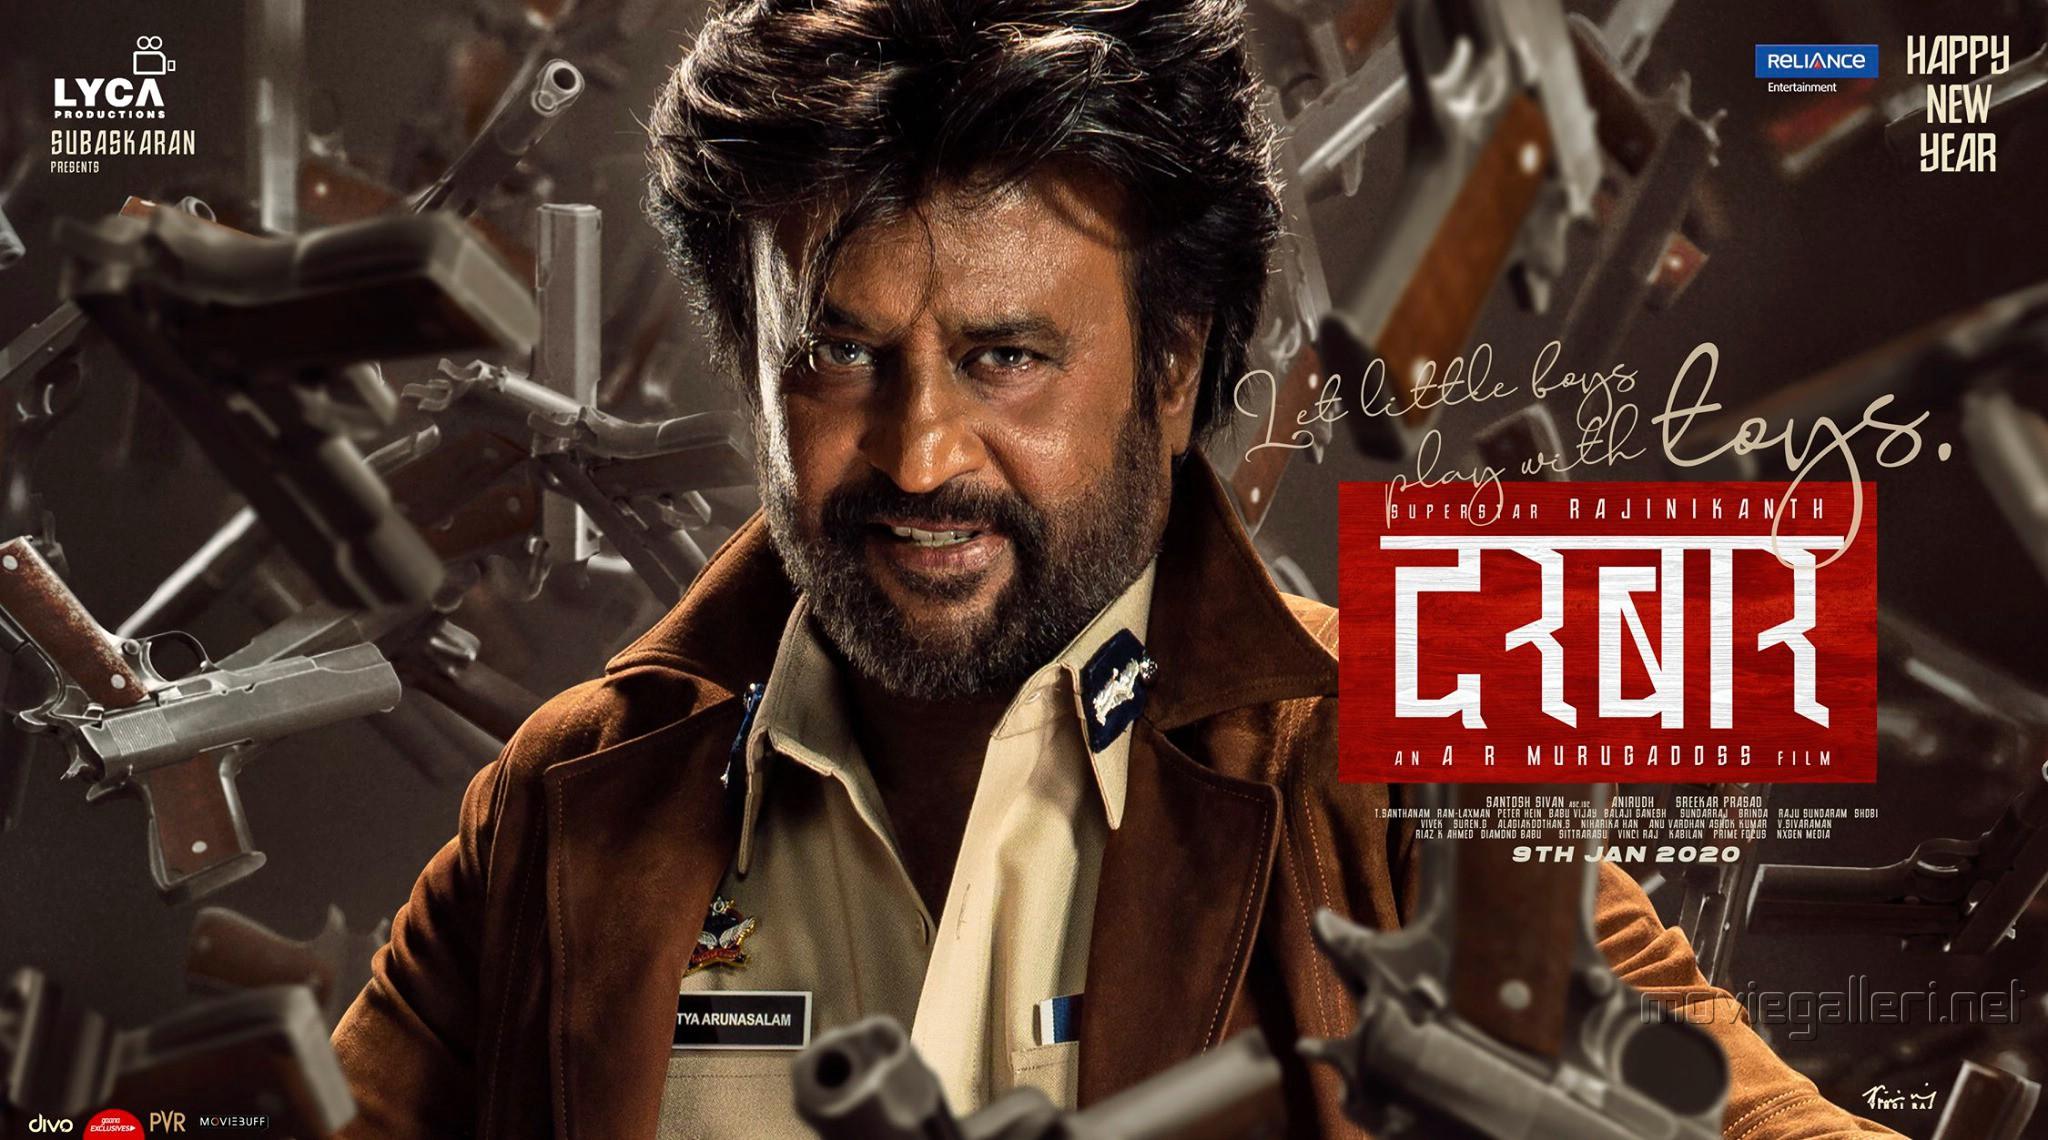 Rajinikanth Darbar Movie New Year 2020 Wishes Posters HD 900e6a5